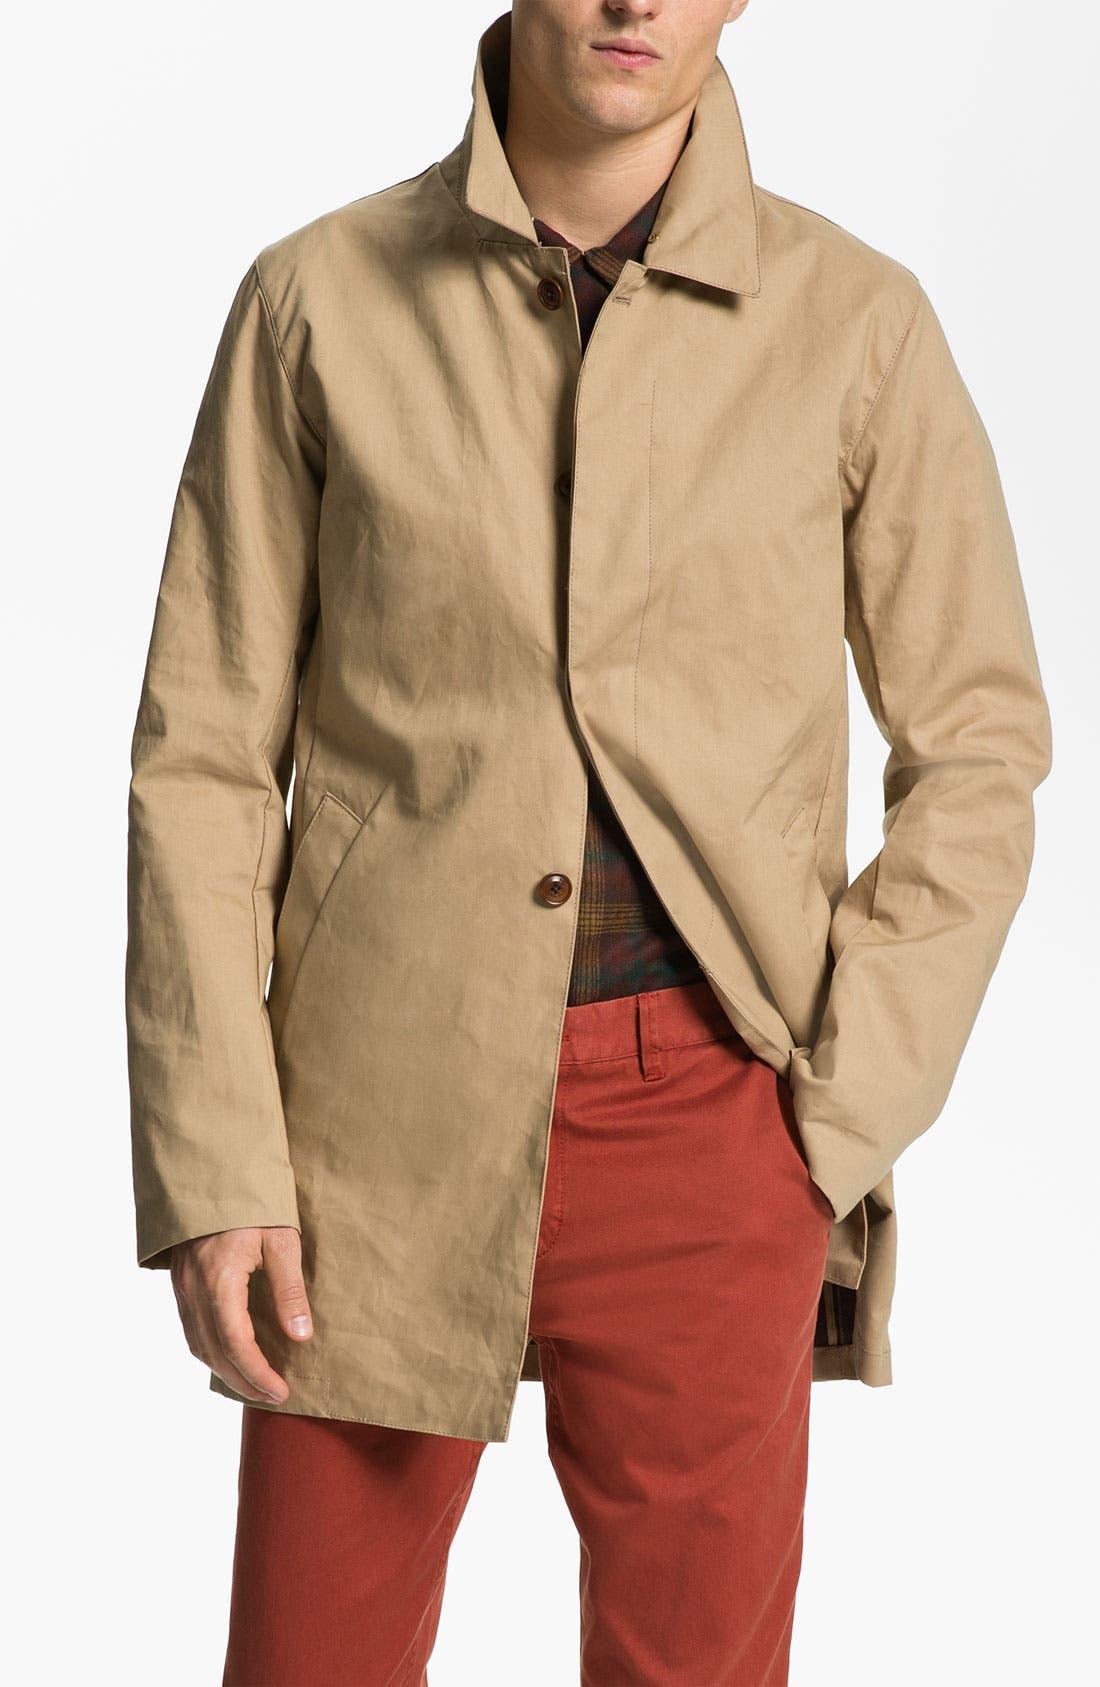 Main Image - Scotch & Soda 'Monsieur' Half Long Trench Coat